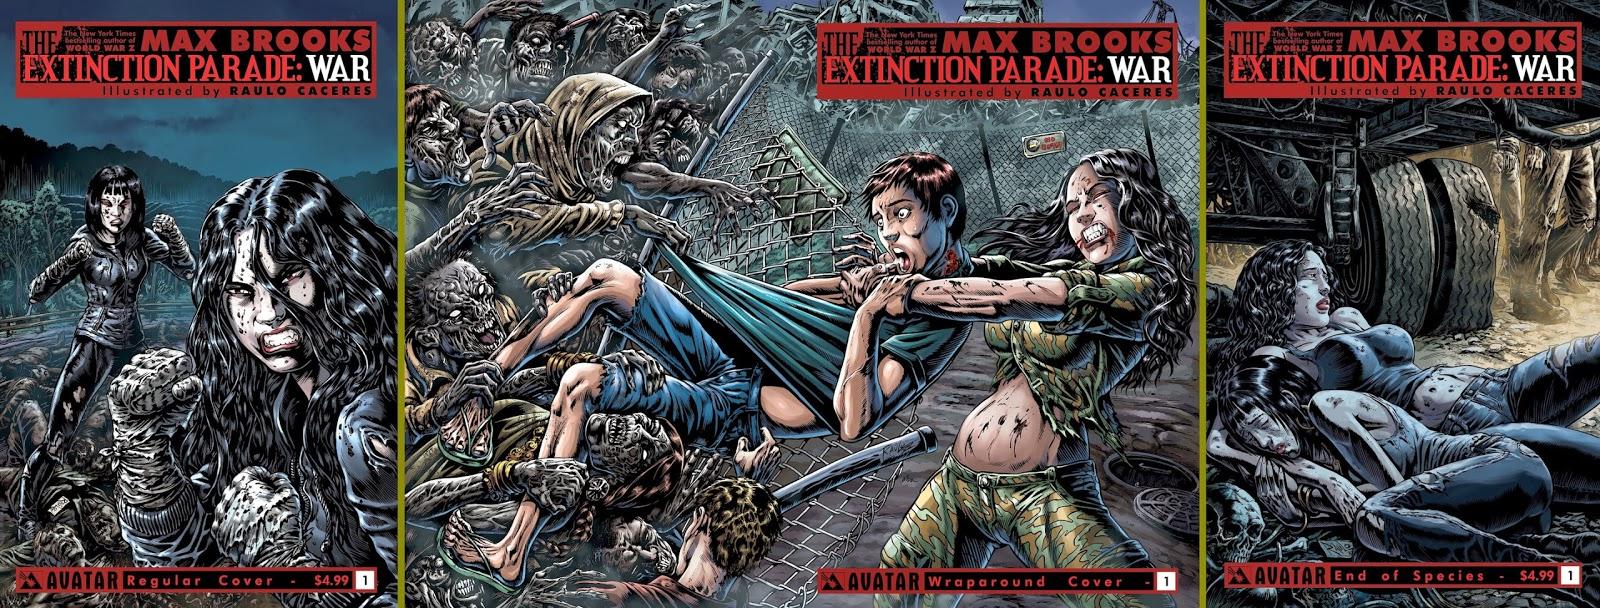 Extinction Parade: War